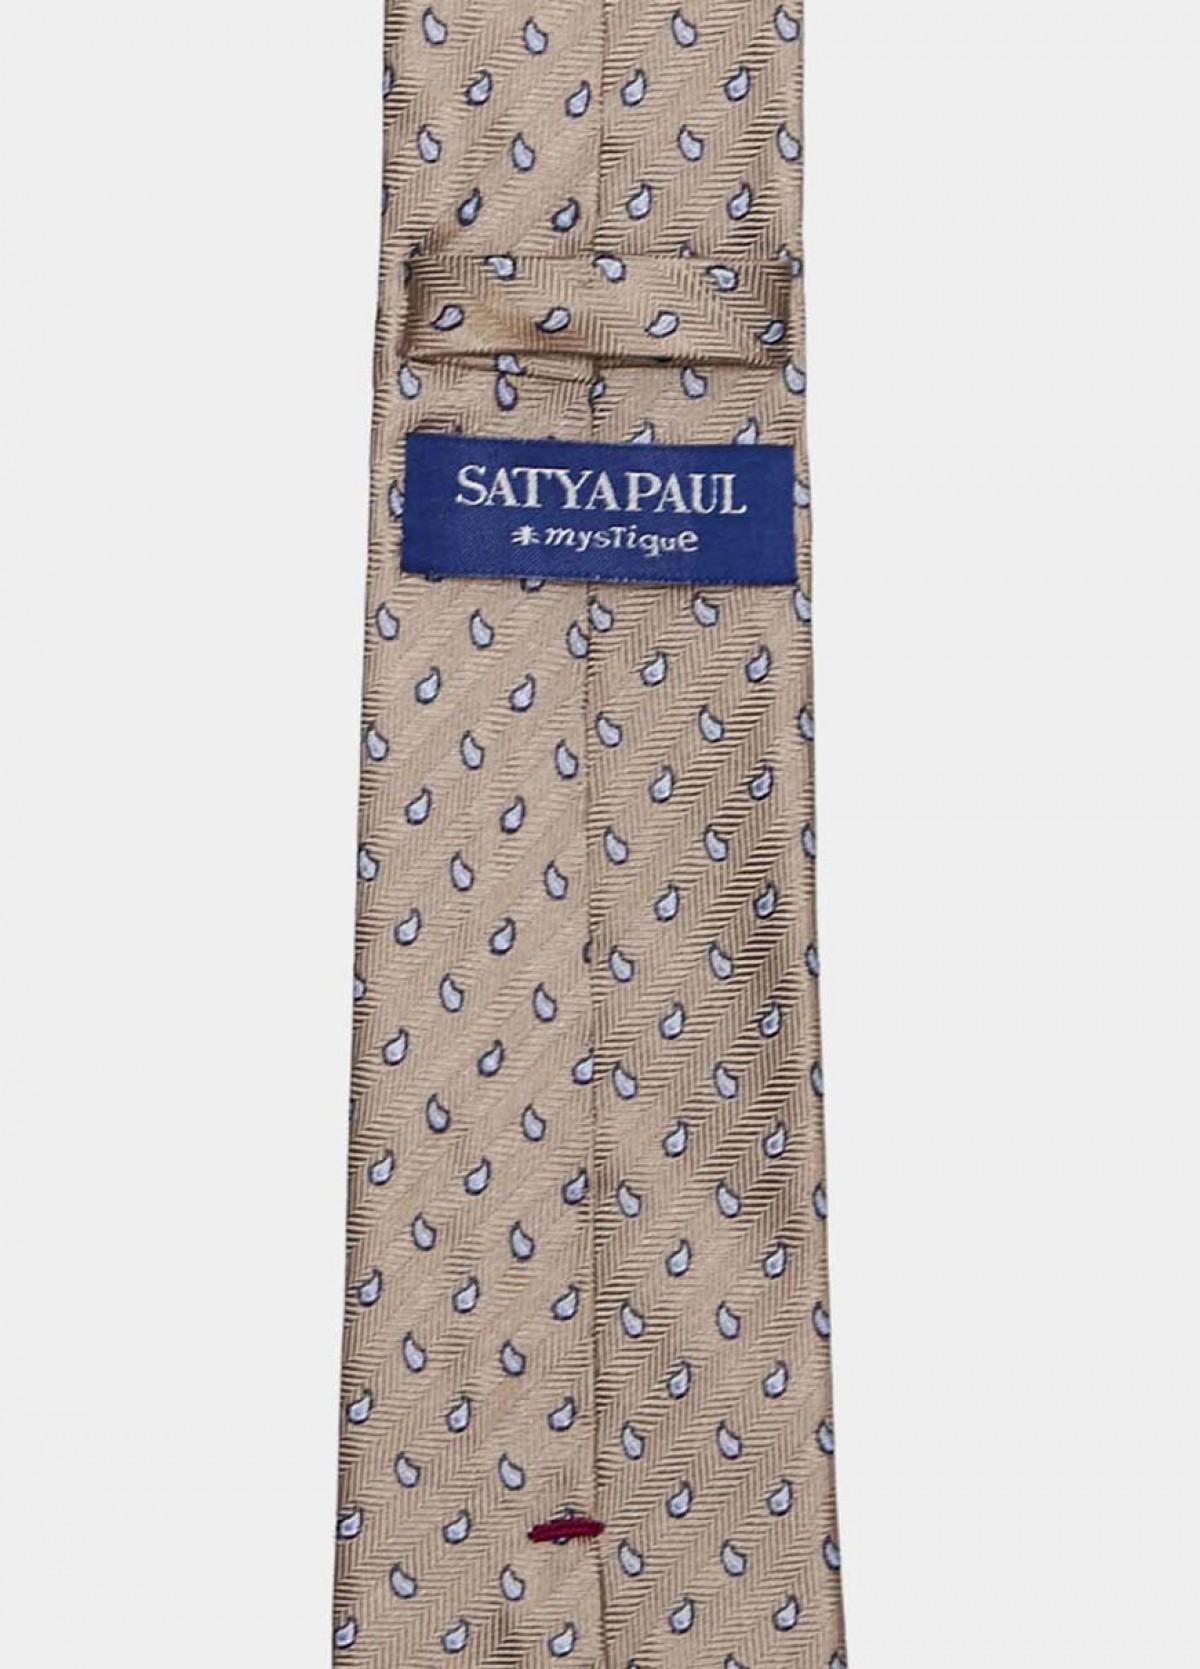 The Beige Stain Resistant Tie